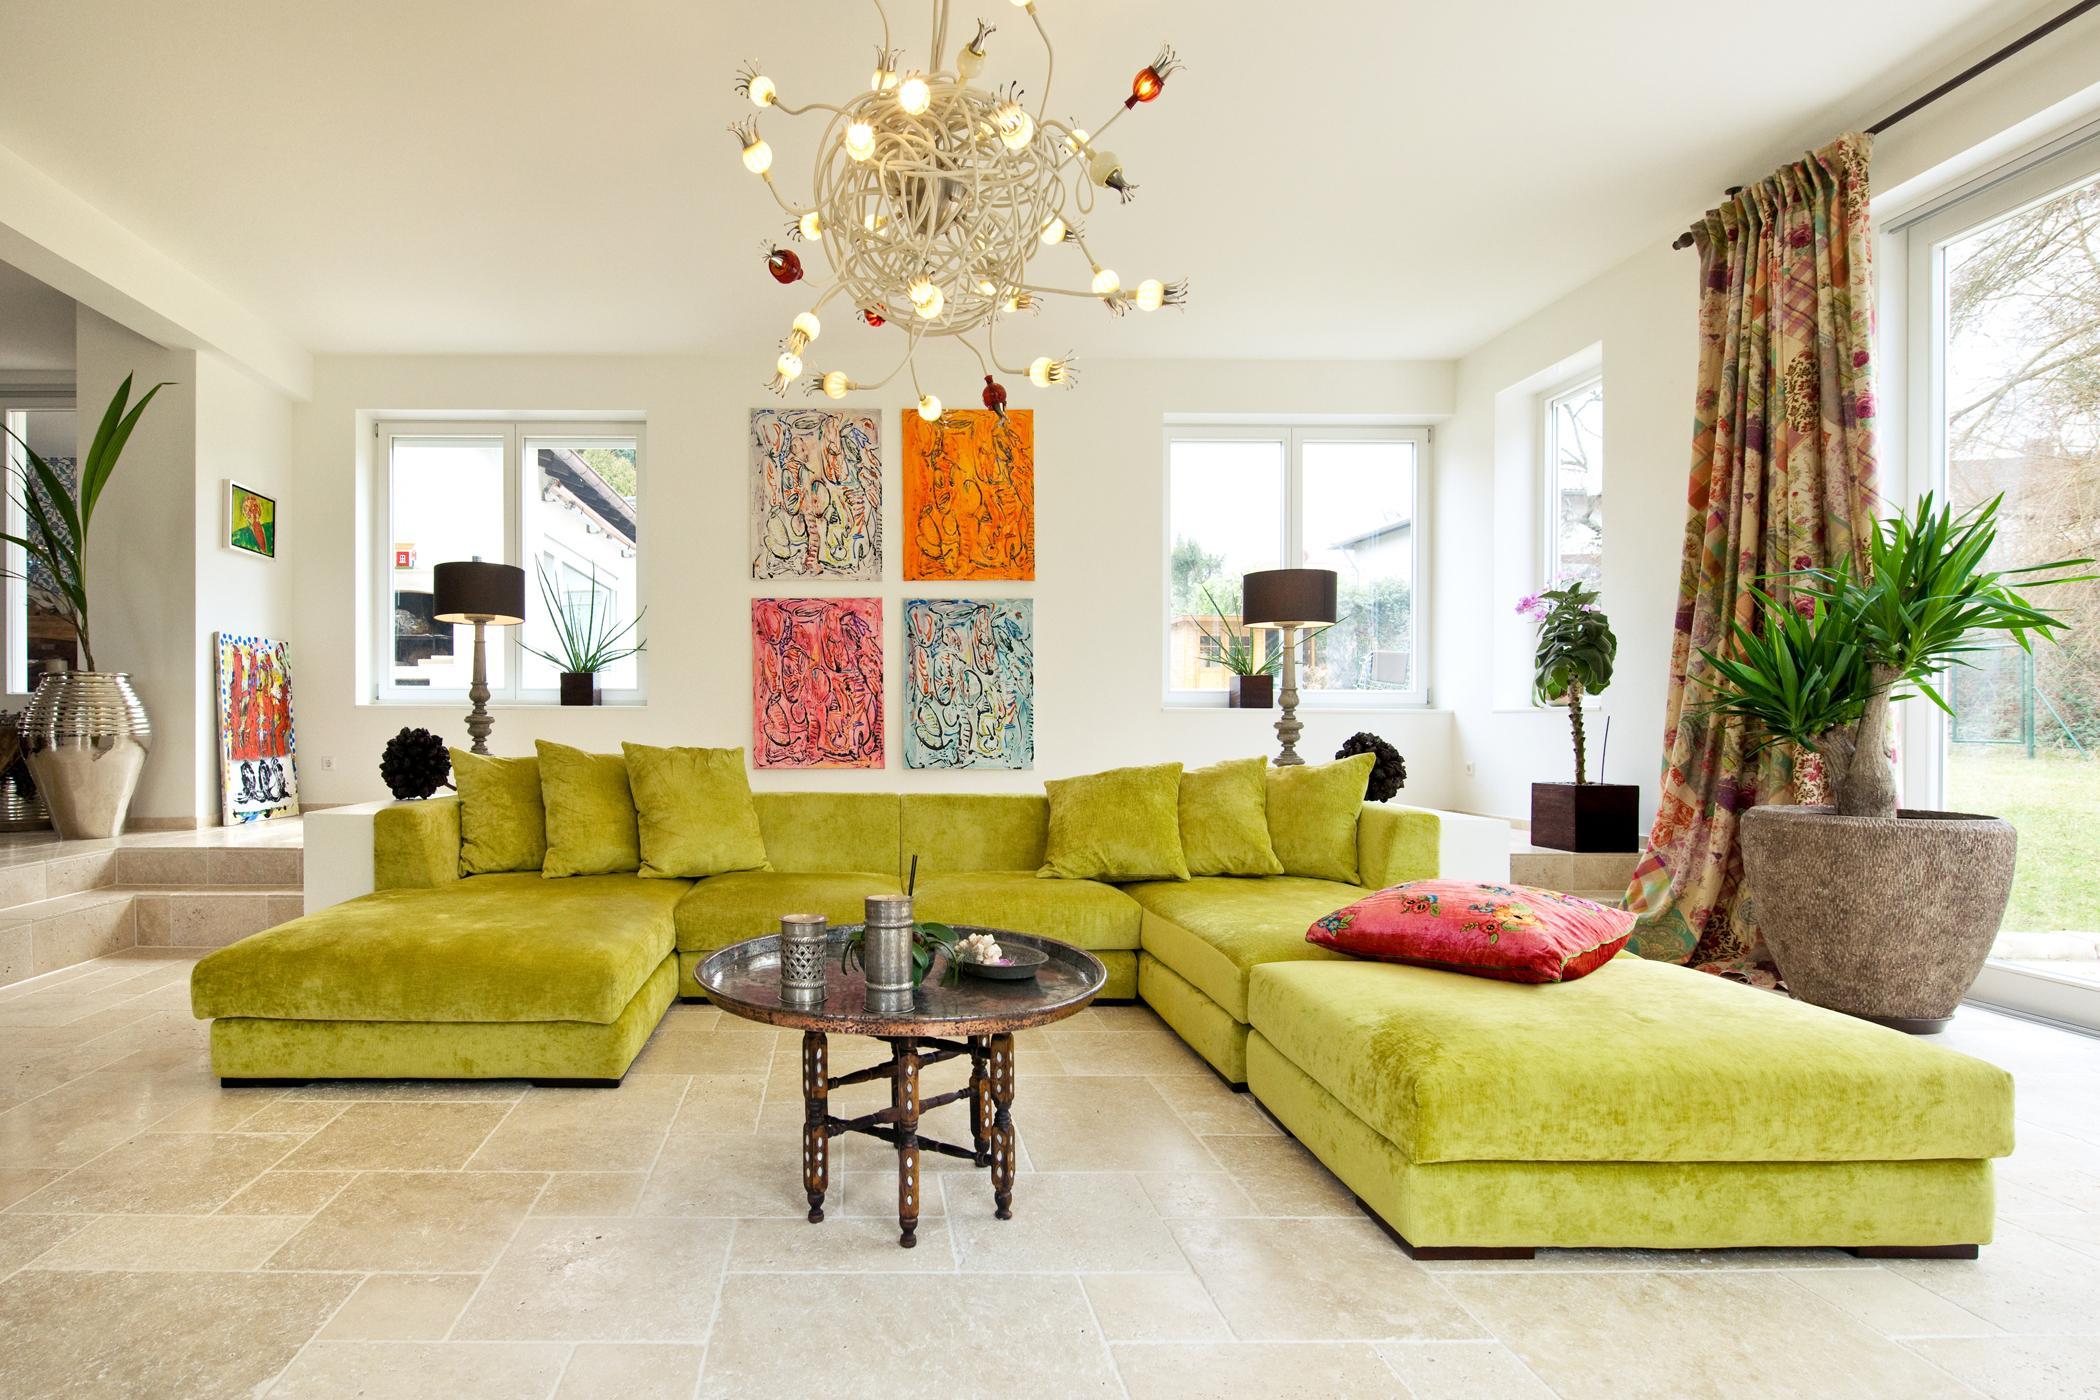 24 Wohnzimmer Graues Sofa Wandfarbe